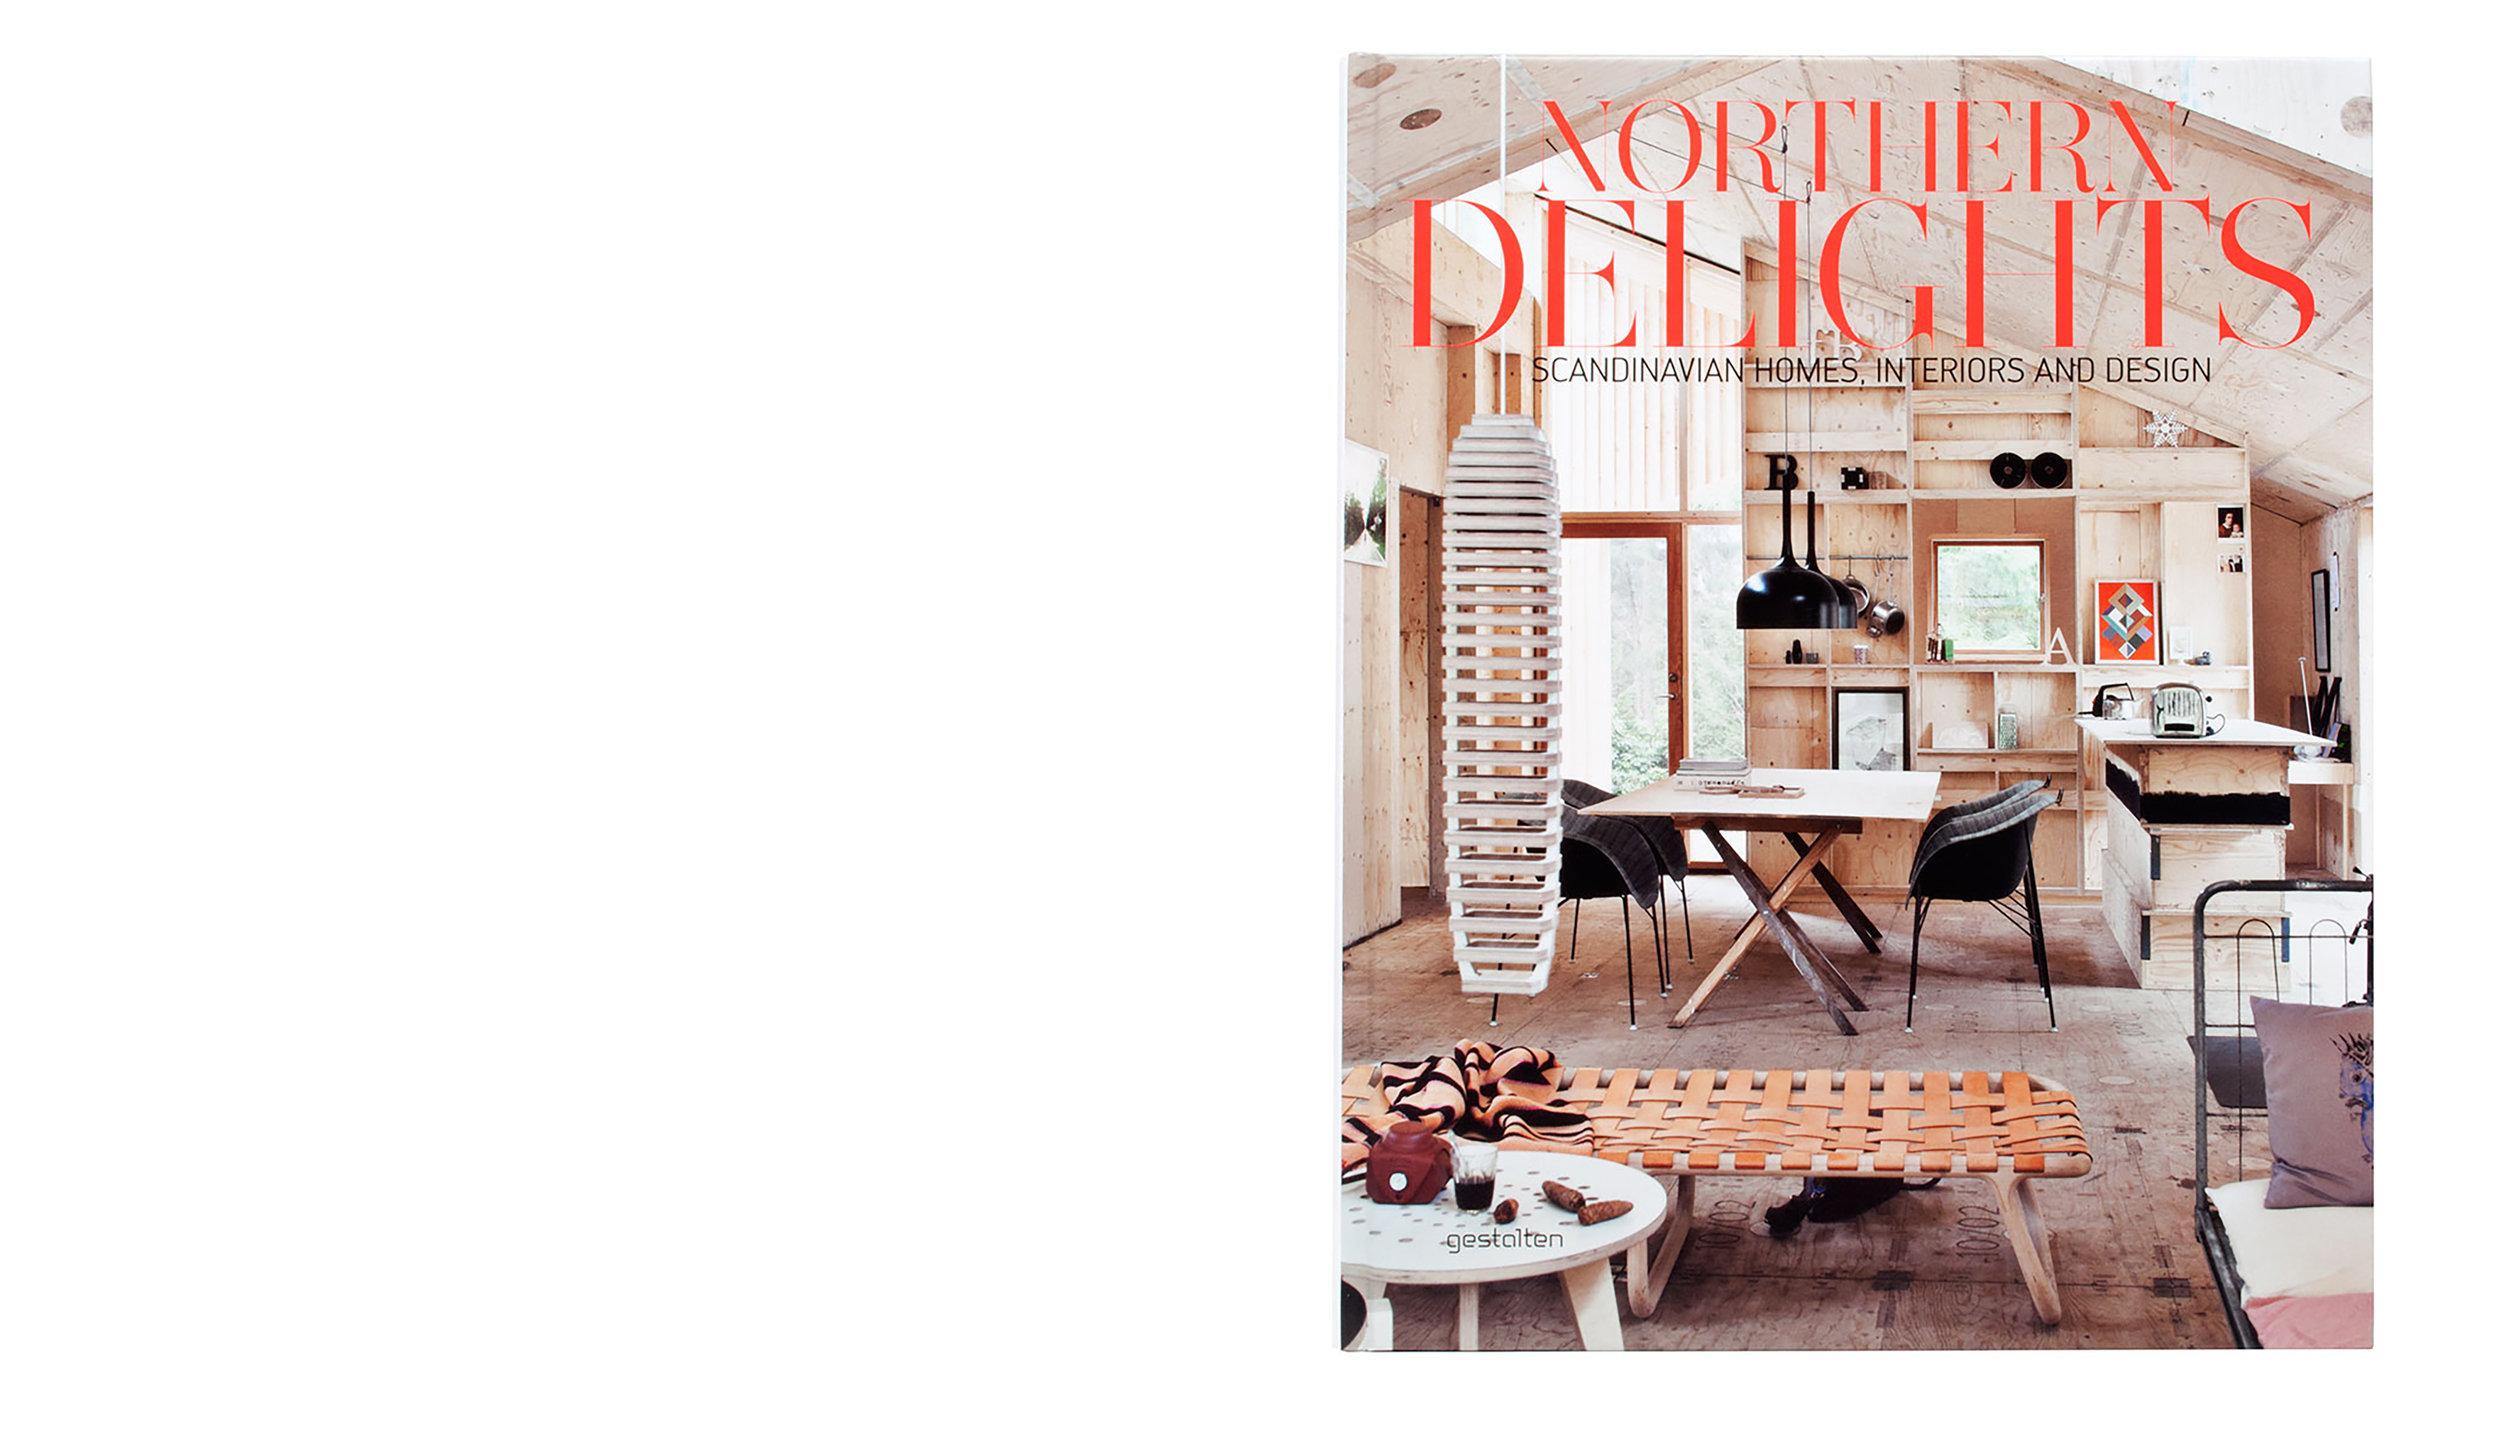 sofie-ladefoged-press-northern-delights-2013-page-04.jpg